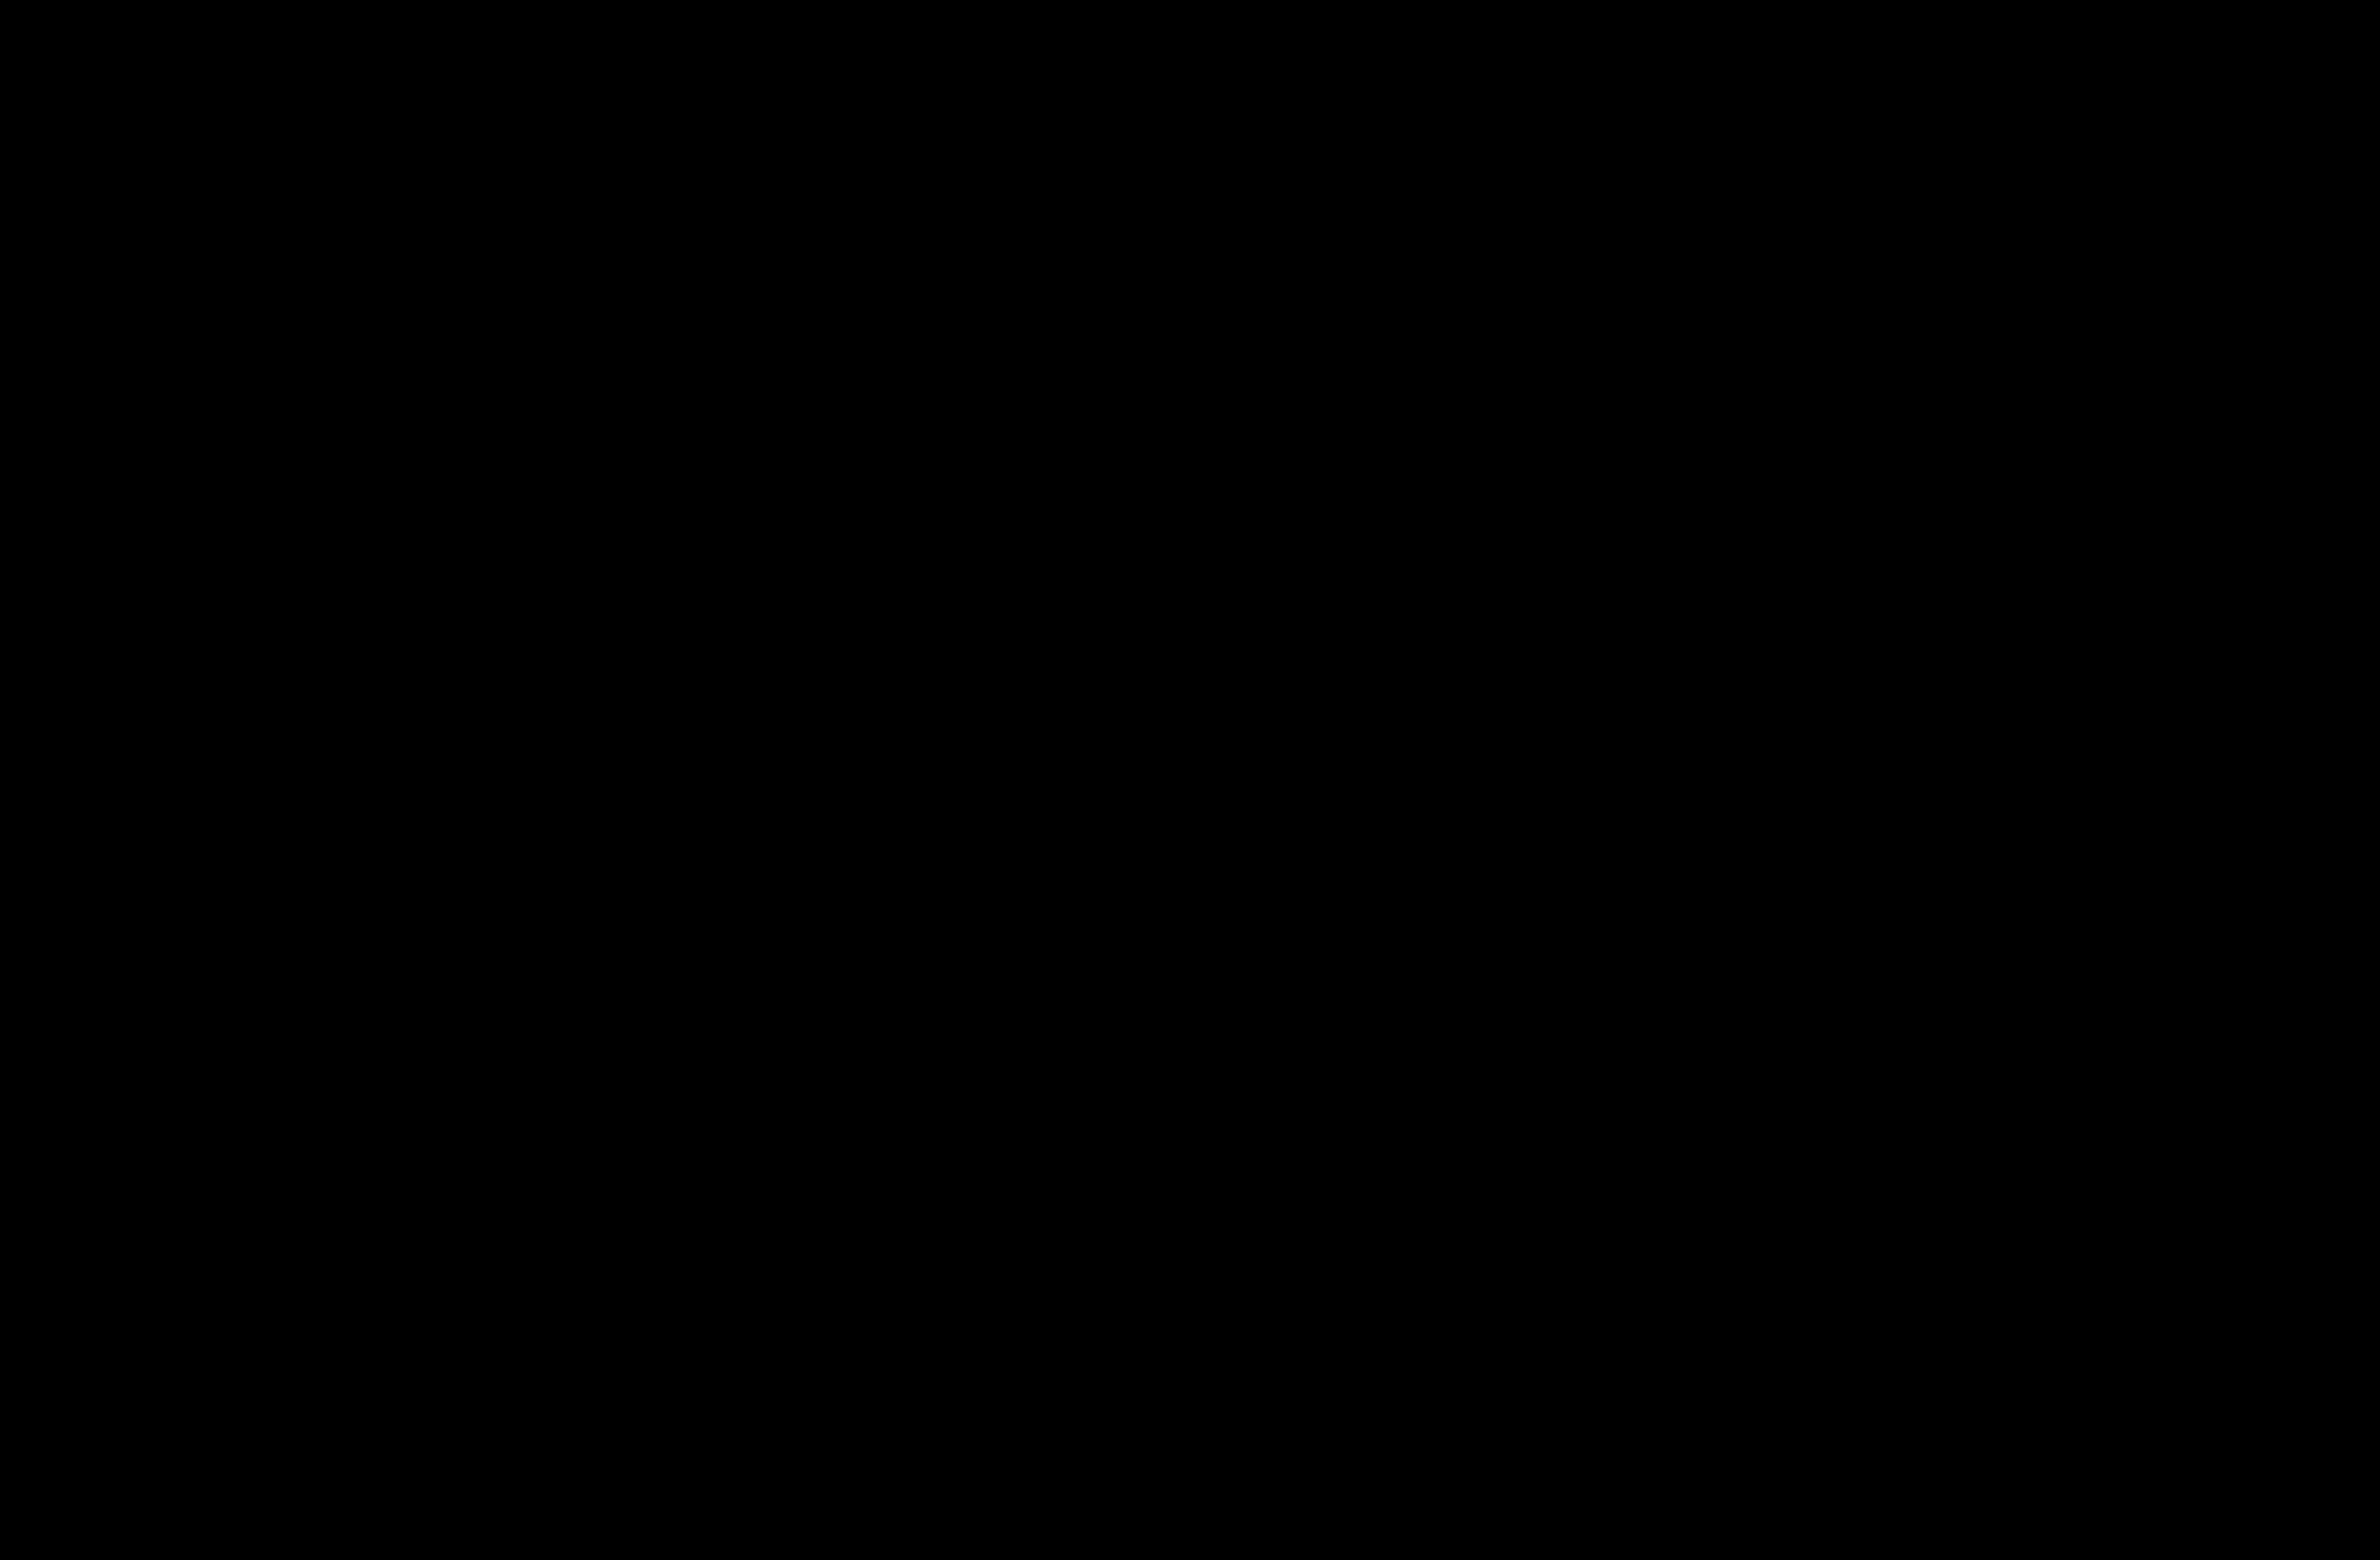 Prolozone